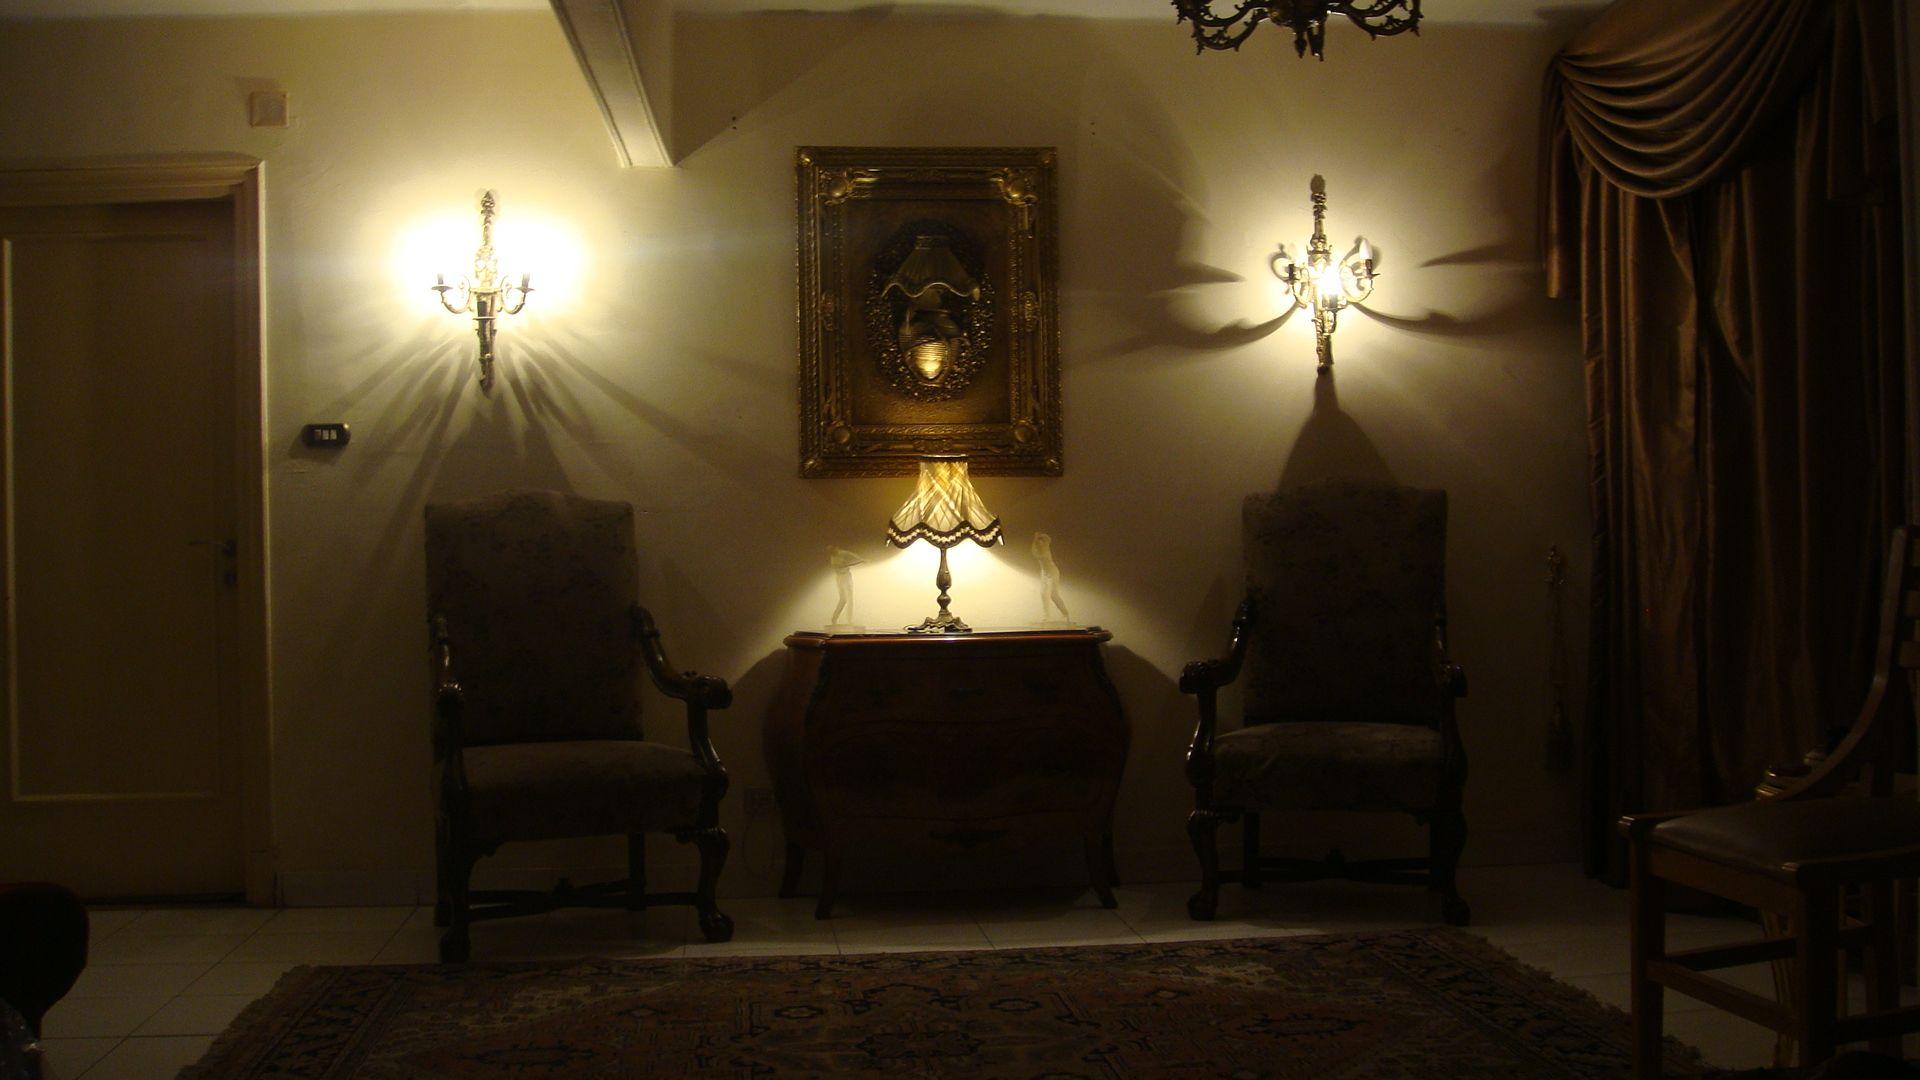 apartment for rent in zamalek. open kitchen one bathroom 2